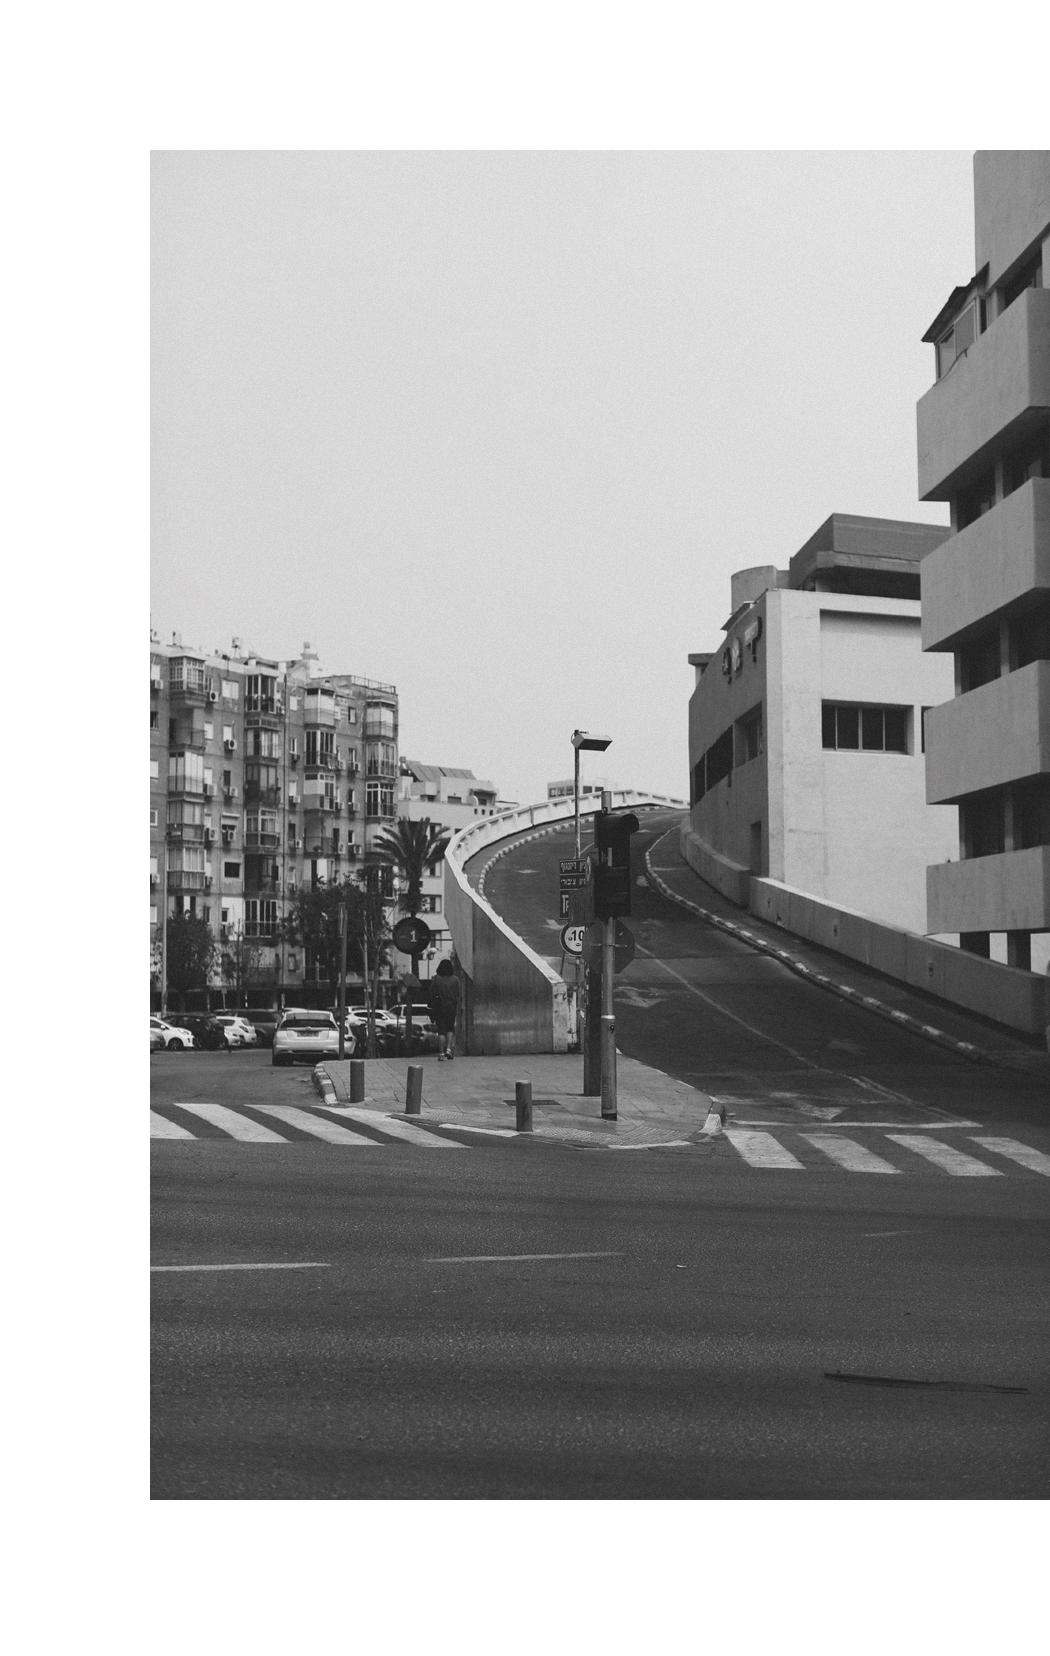 A Visual Story - Shot by Fiona Dinkelbach - Tel Aviv, Israel